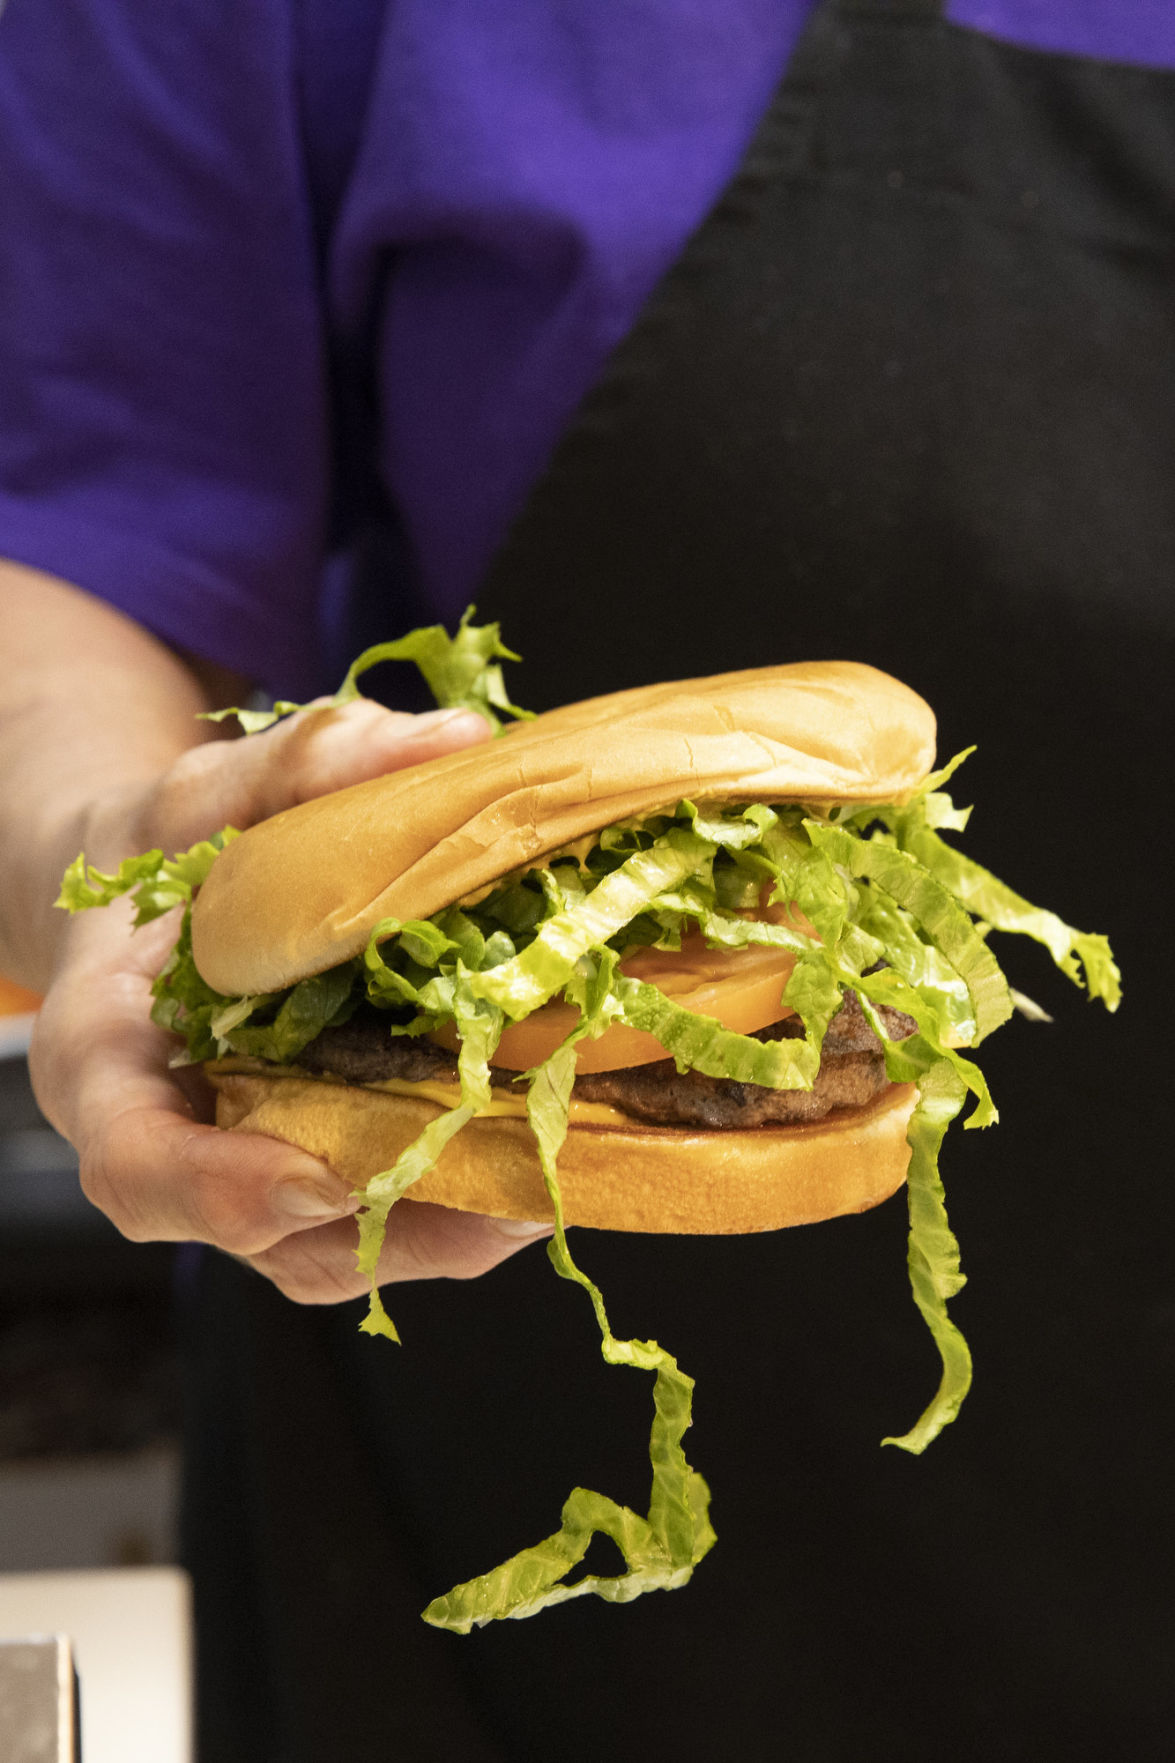 Jim Big Burger named amoung the best